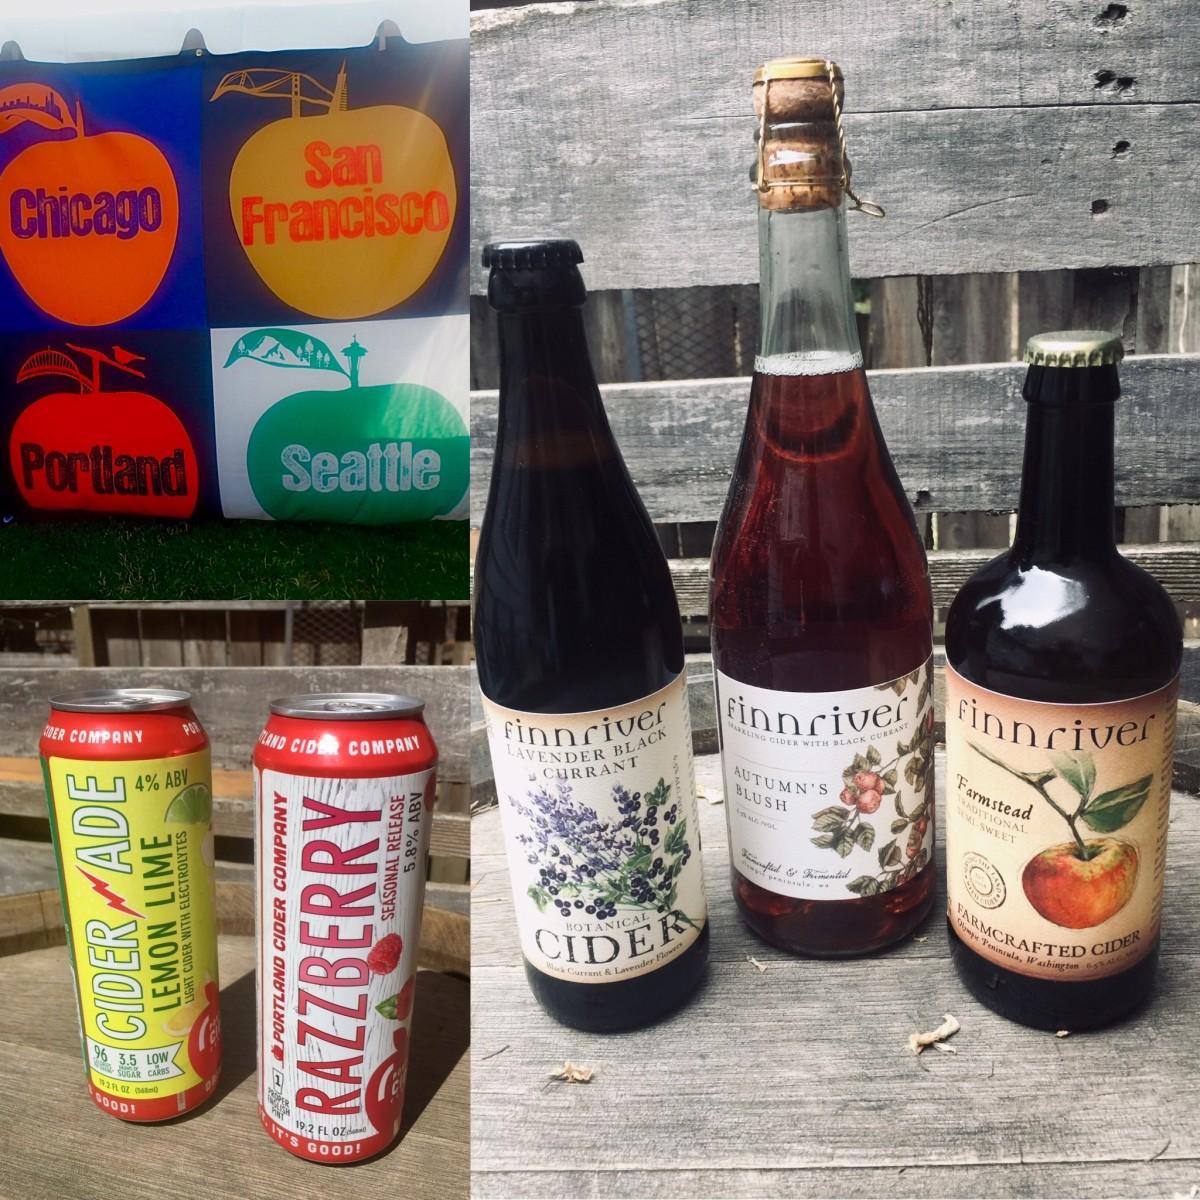 (L to R) Cider Summit PDX 2019, Portland Cider Company, Finnriver Cidery & Farm